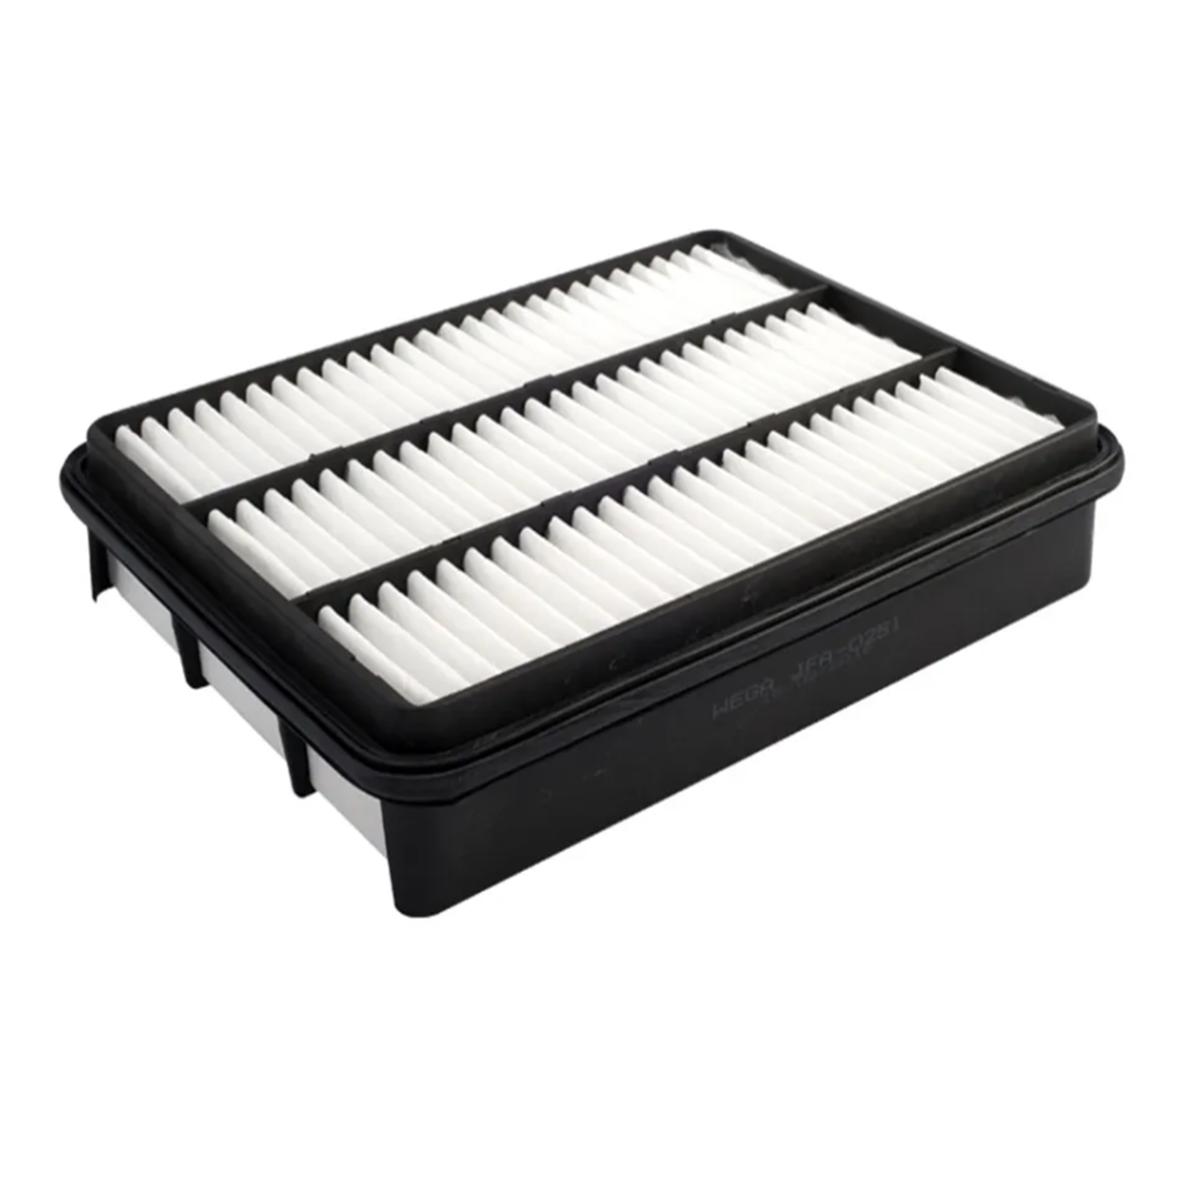 Filtro de AR Wega JFA0251/ Tecfil ARL2205 em até 6x sem juros